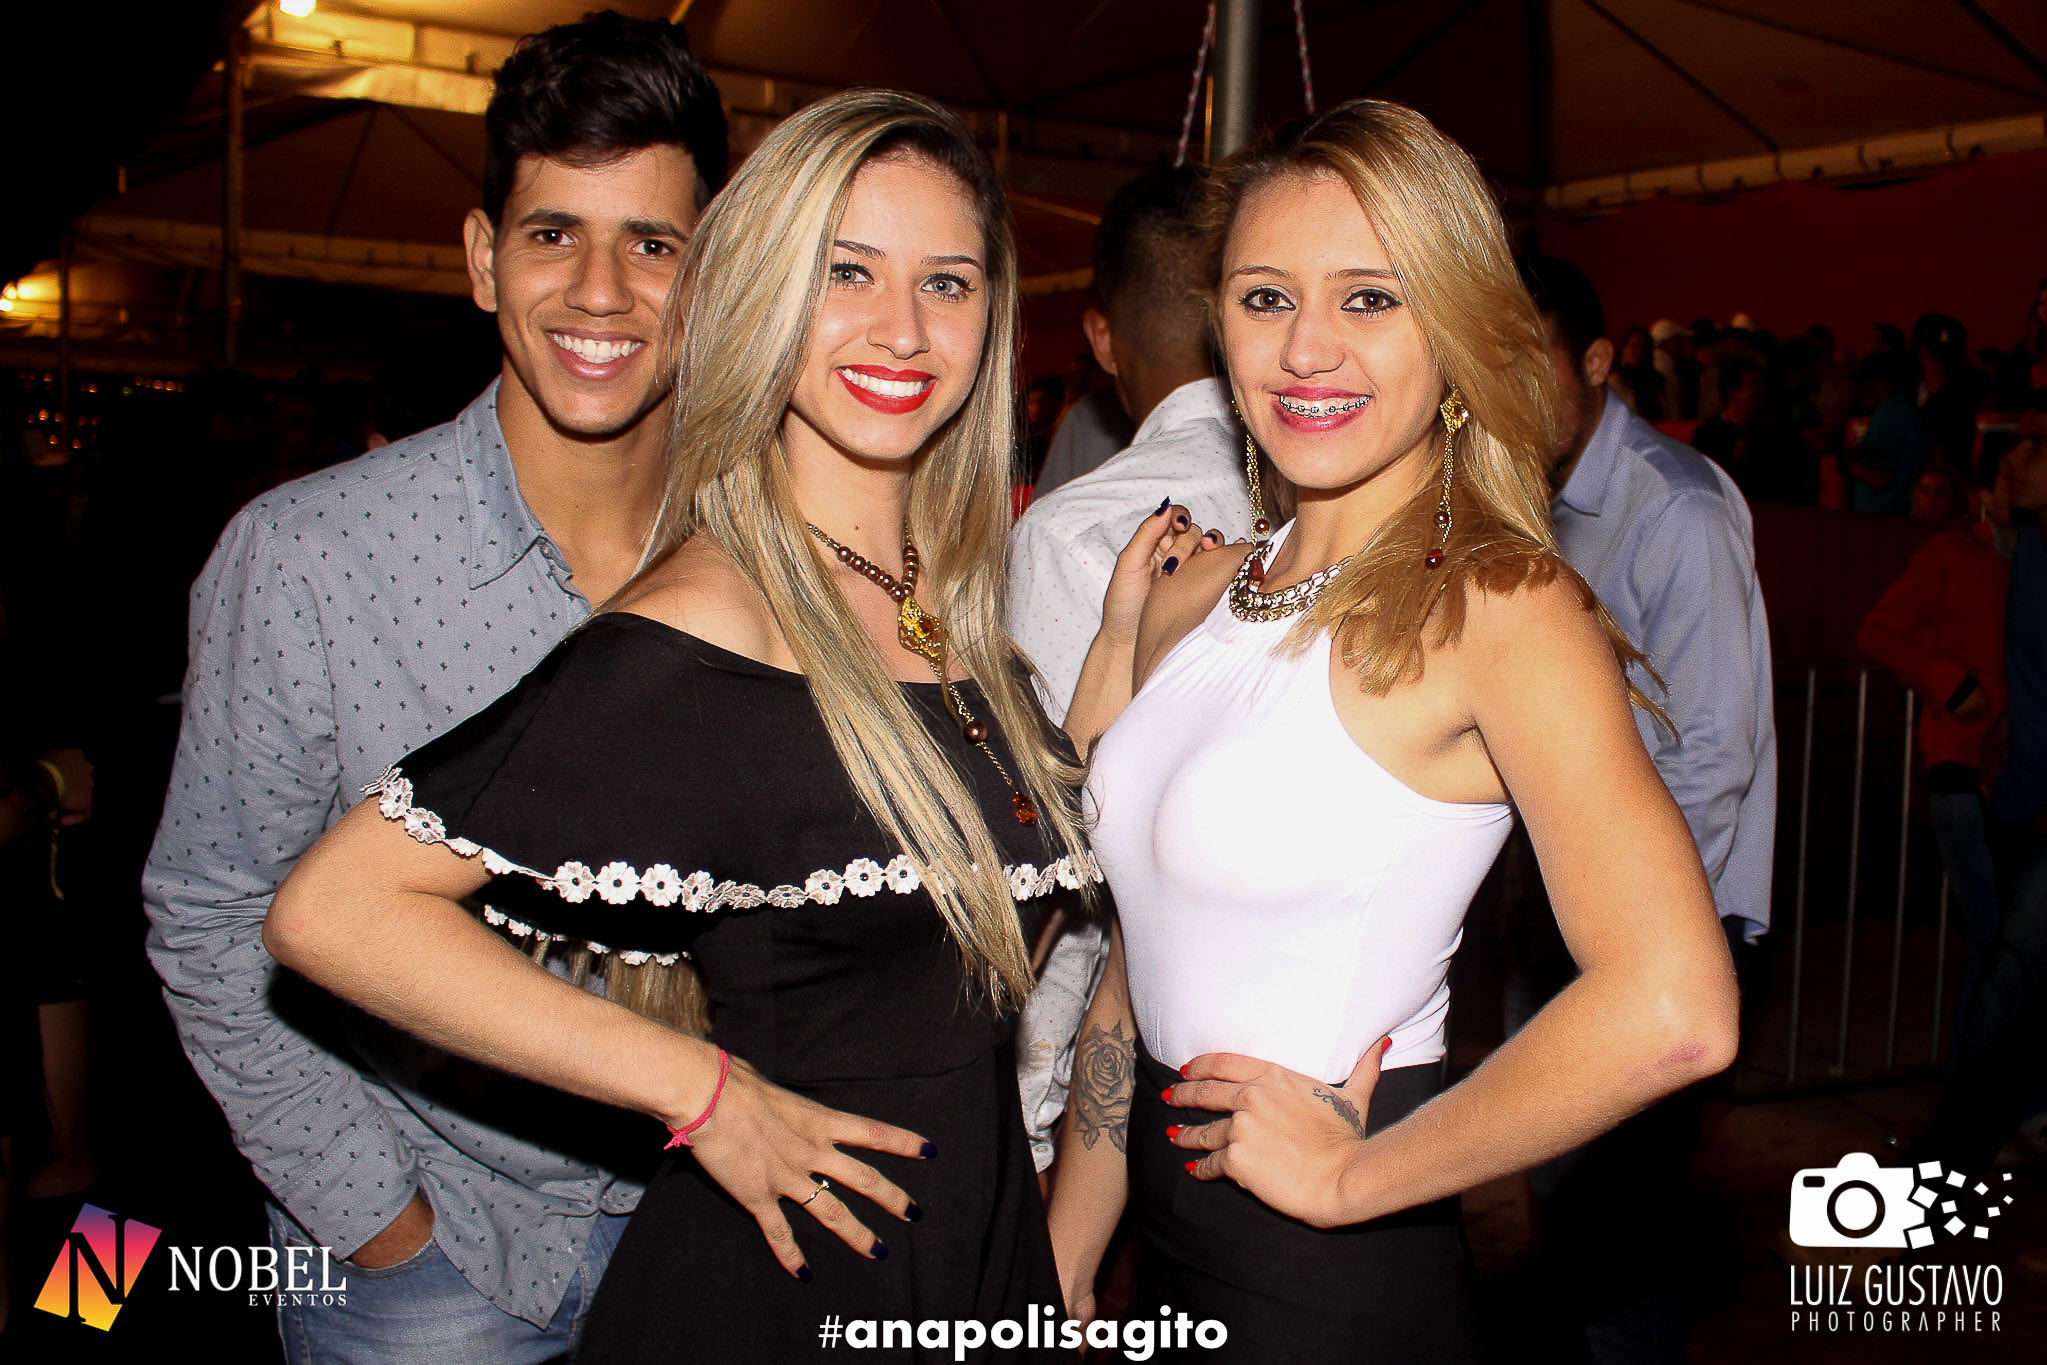 Luiz Gustavo Photographer-103